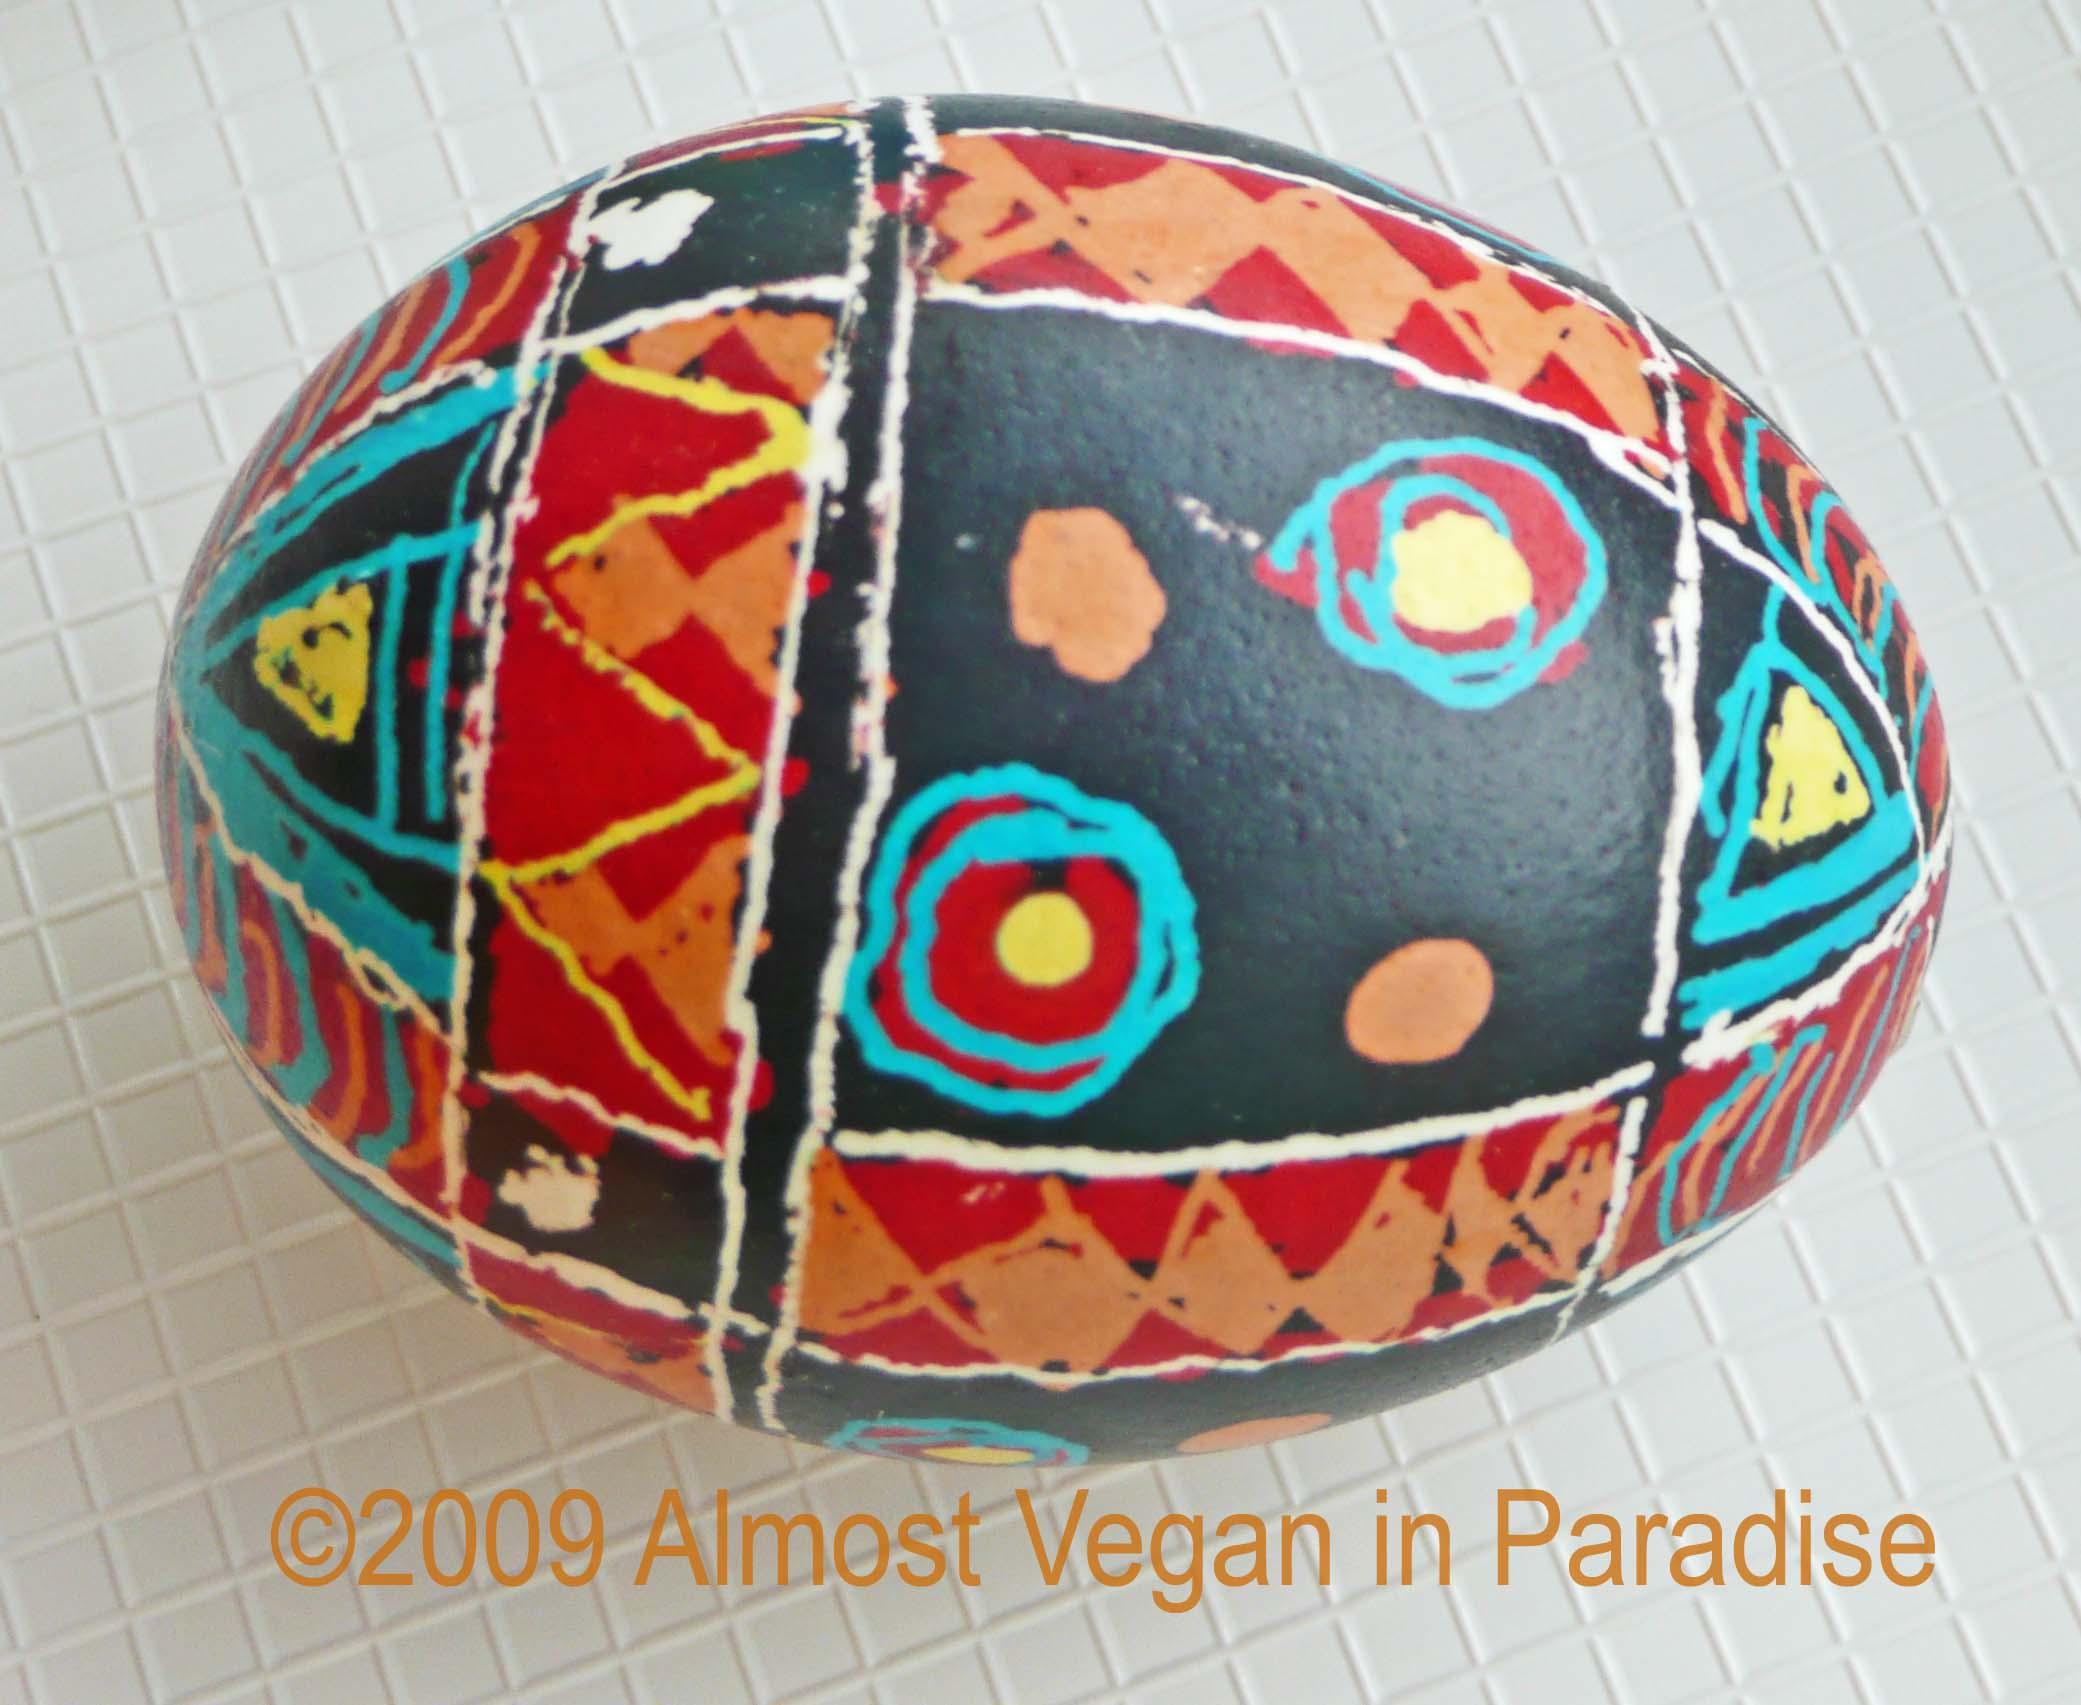 Barbara's egg